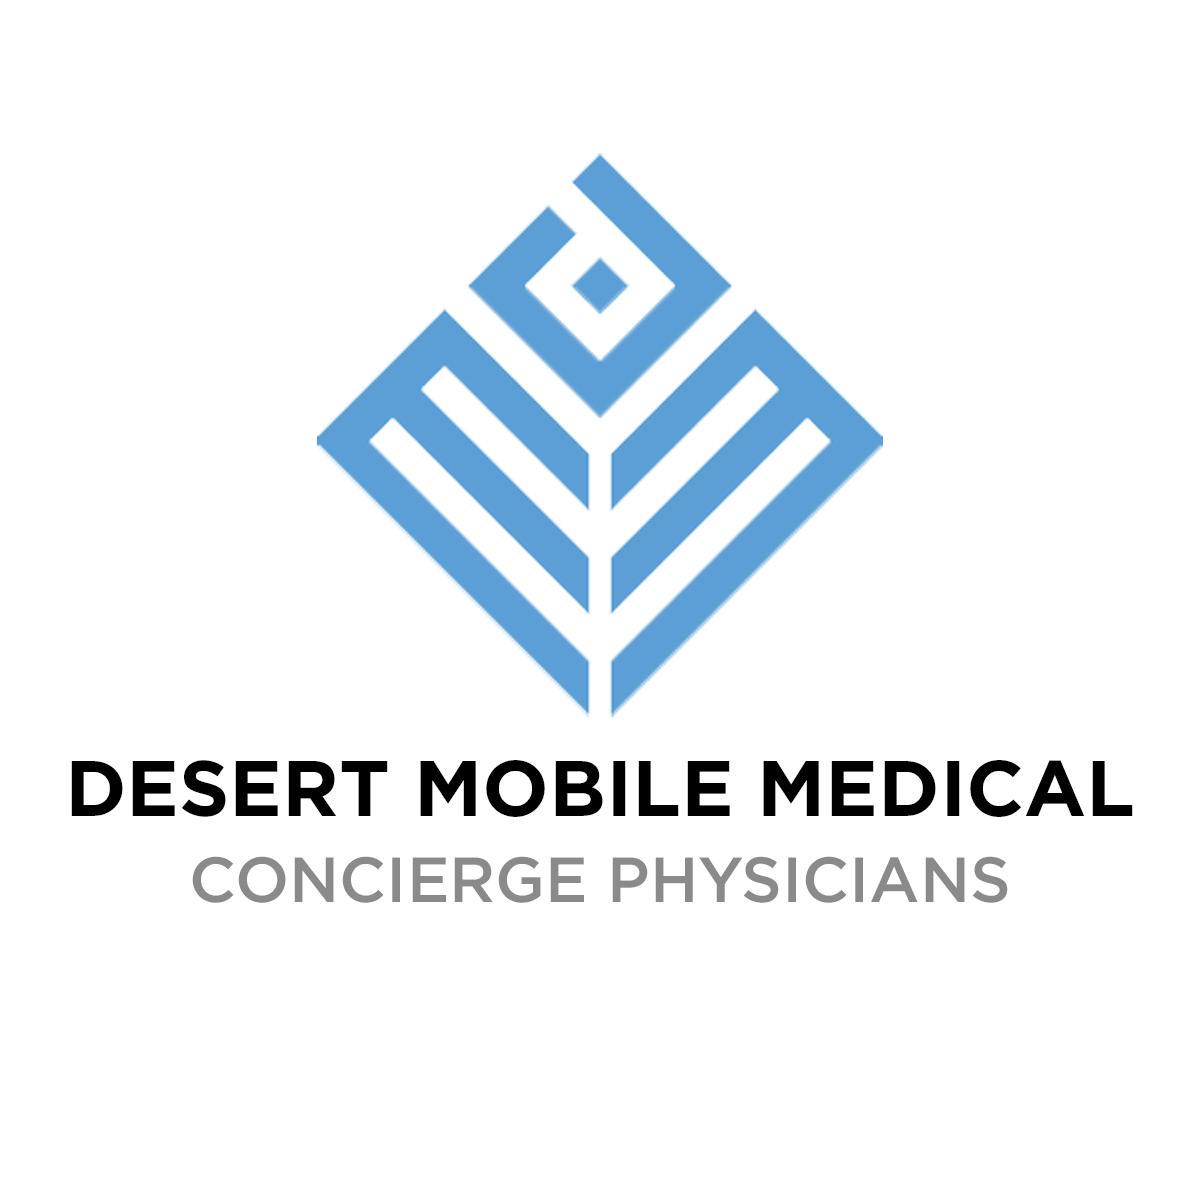 Desert Mobile Medical | Concierge Physicians